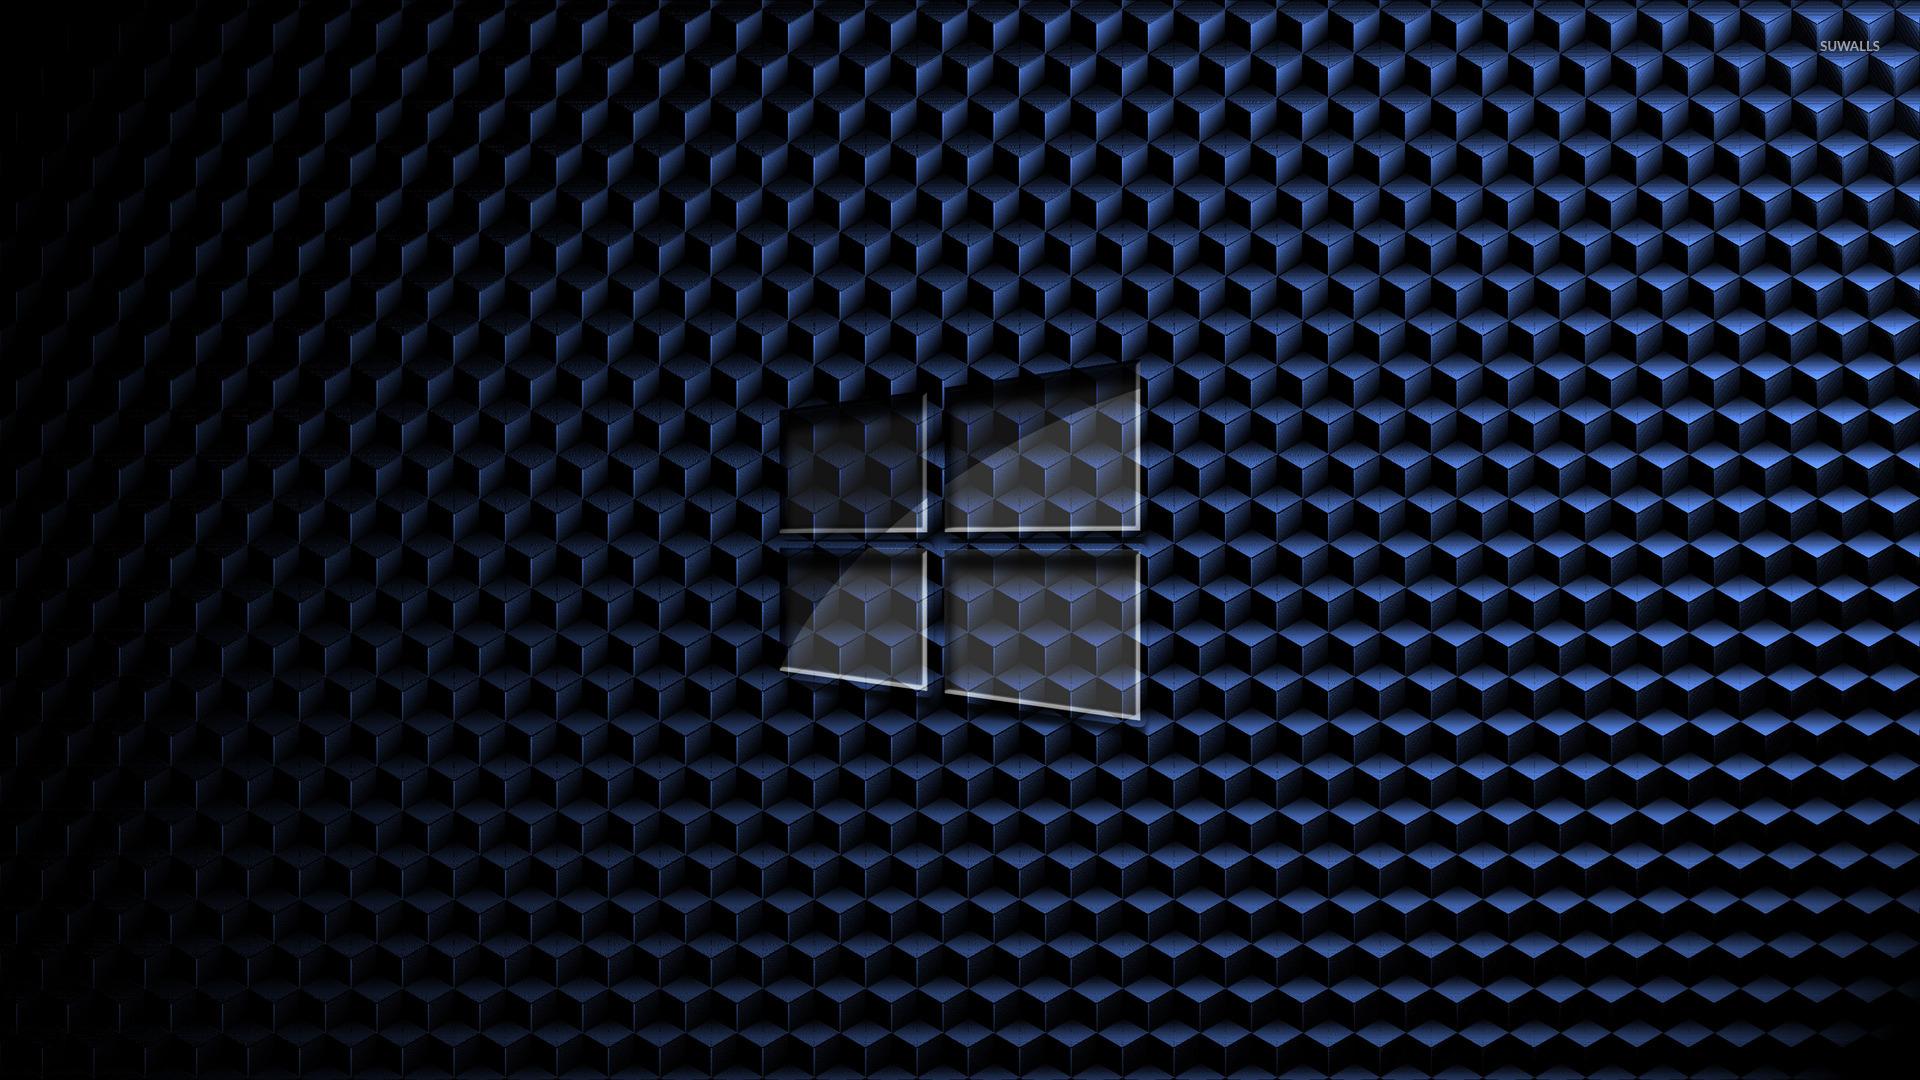 Glass Windows 10 Wallpaper : Glass windows on cube pattern wallpaper computer